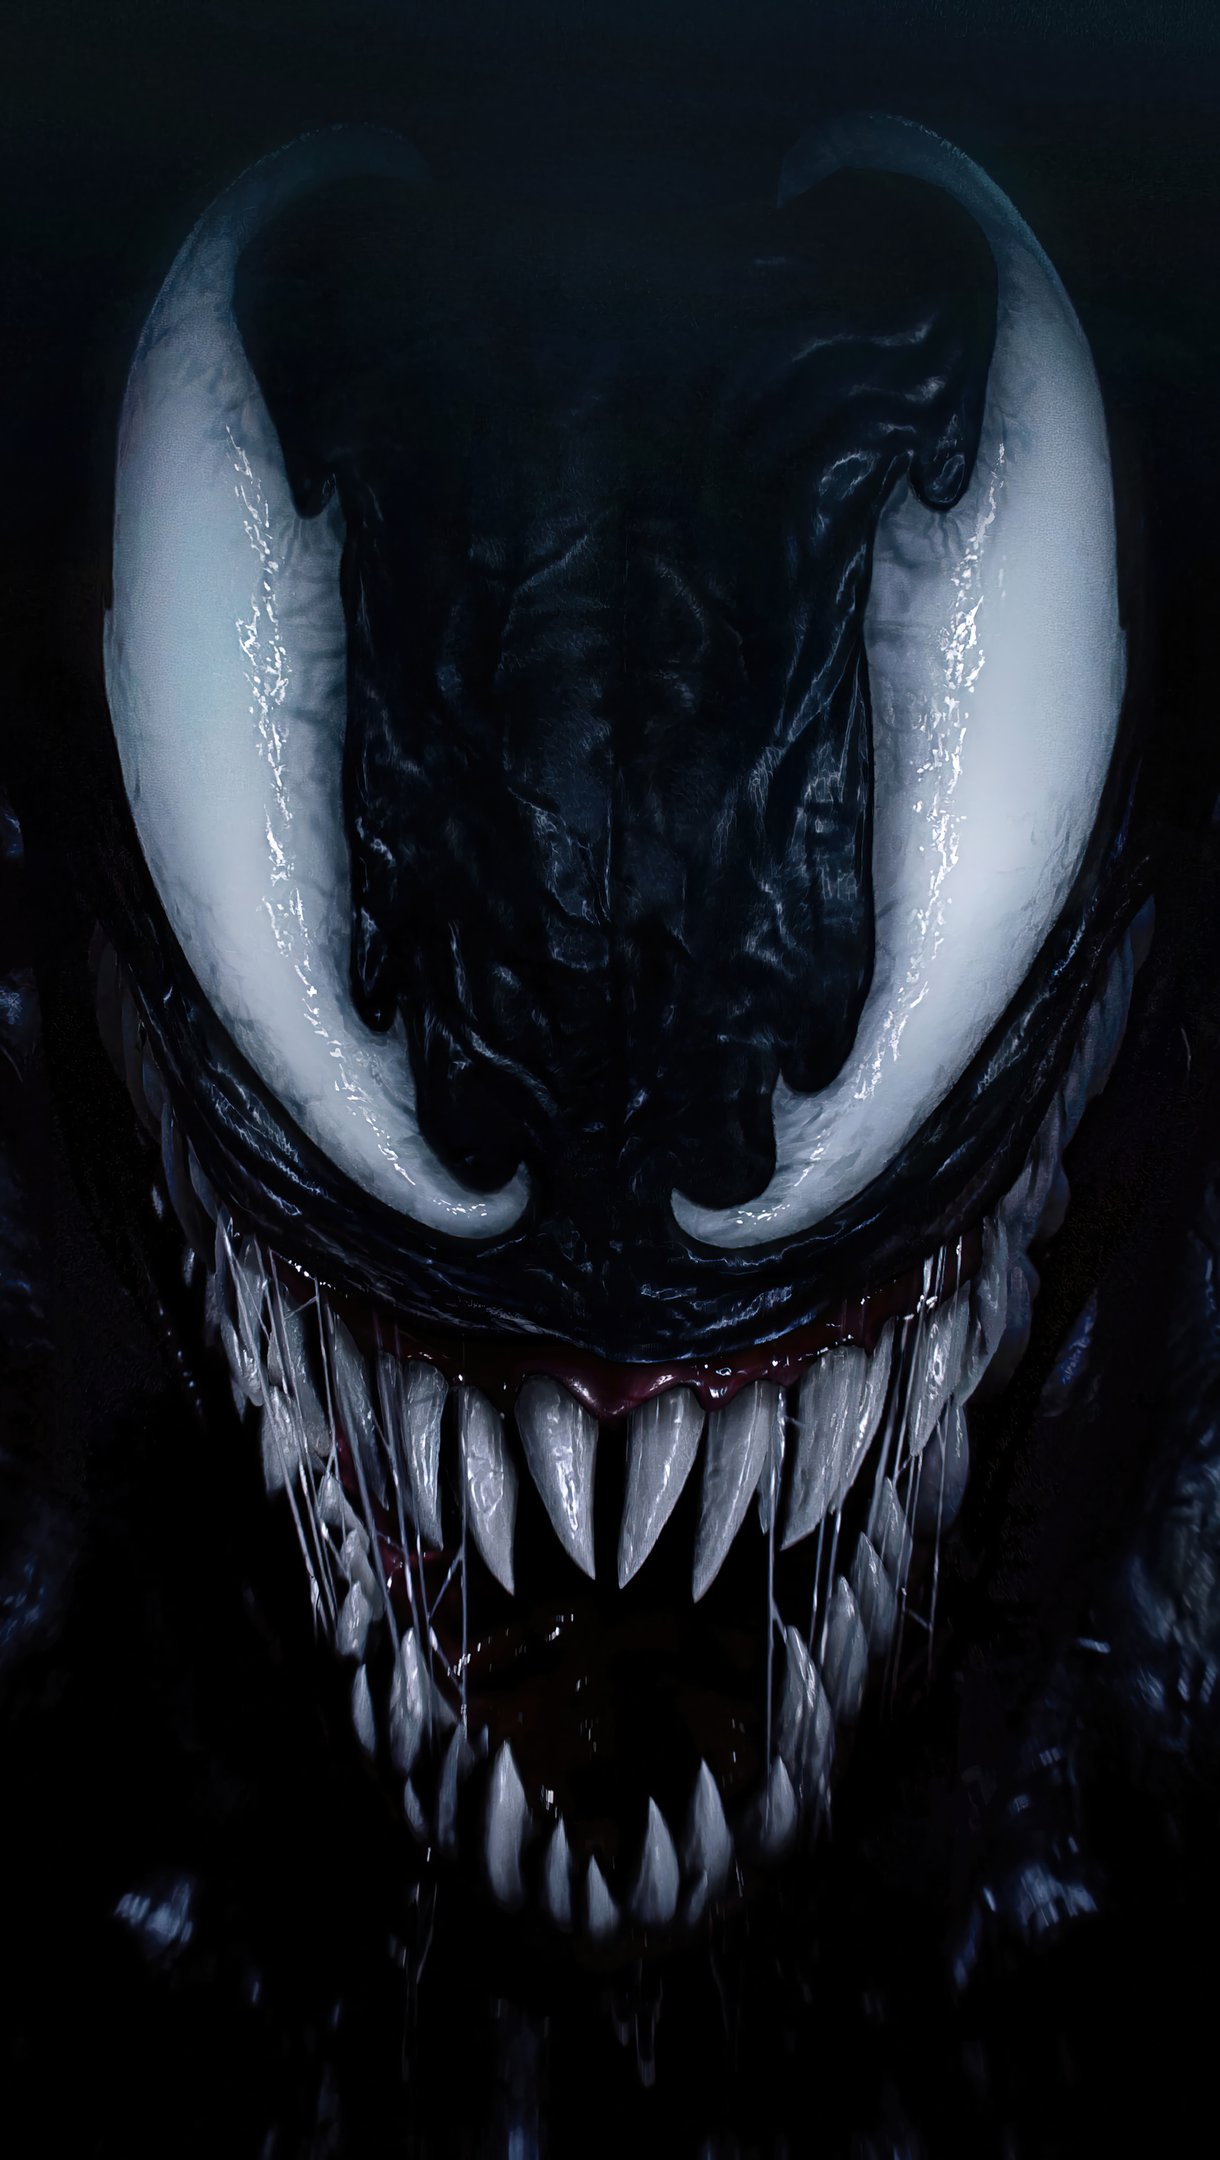 Wallpaper Venom's face Vertical